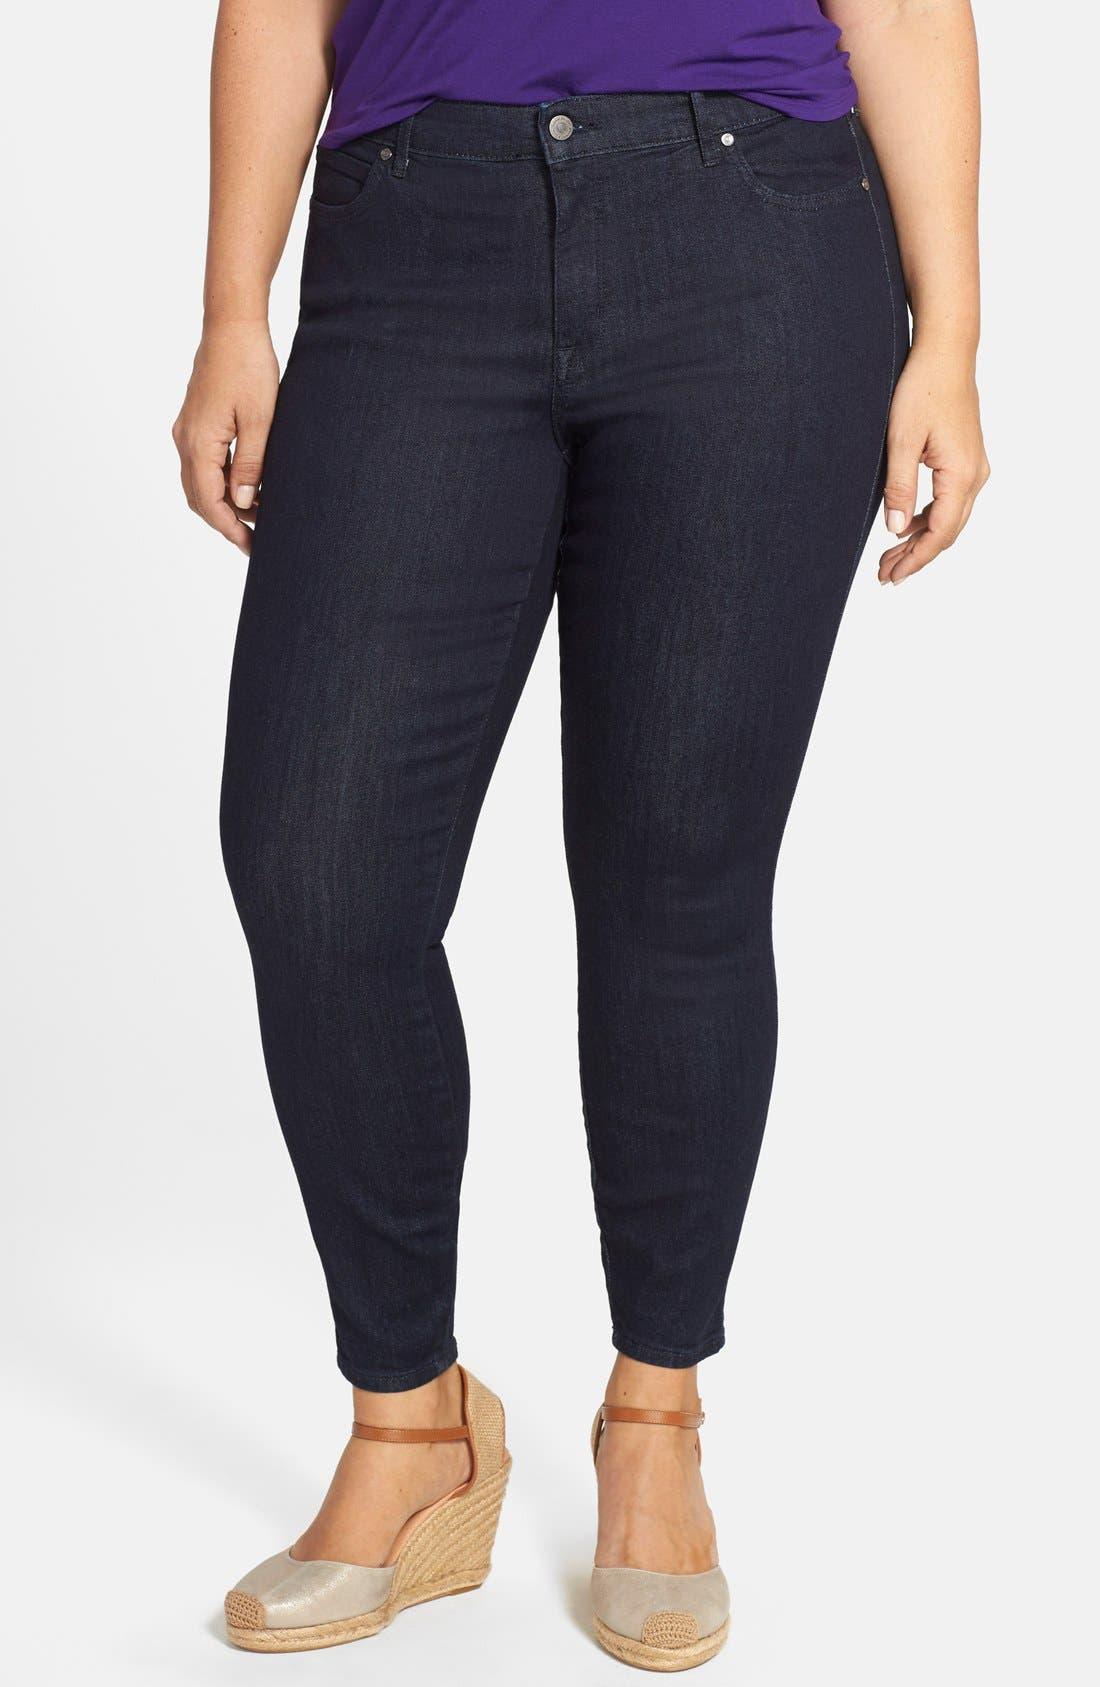 CJ BY COOKIE JOHNSON 'Wisdom' Stretch Ankle Skinny Jeans, Main, color, 400